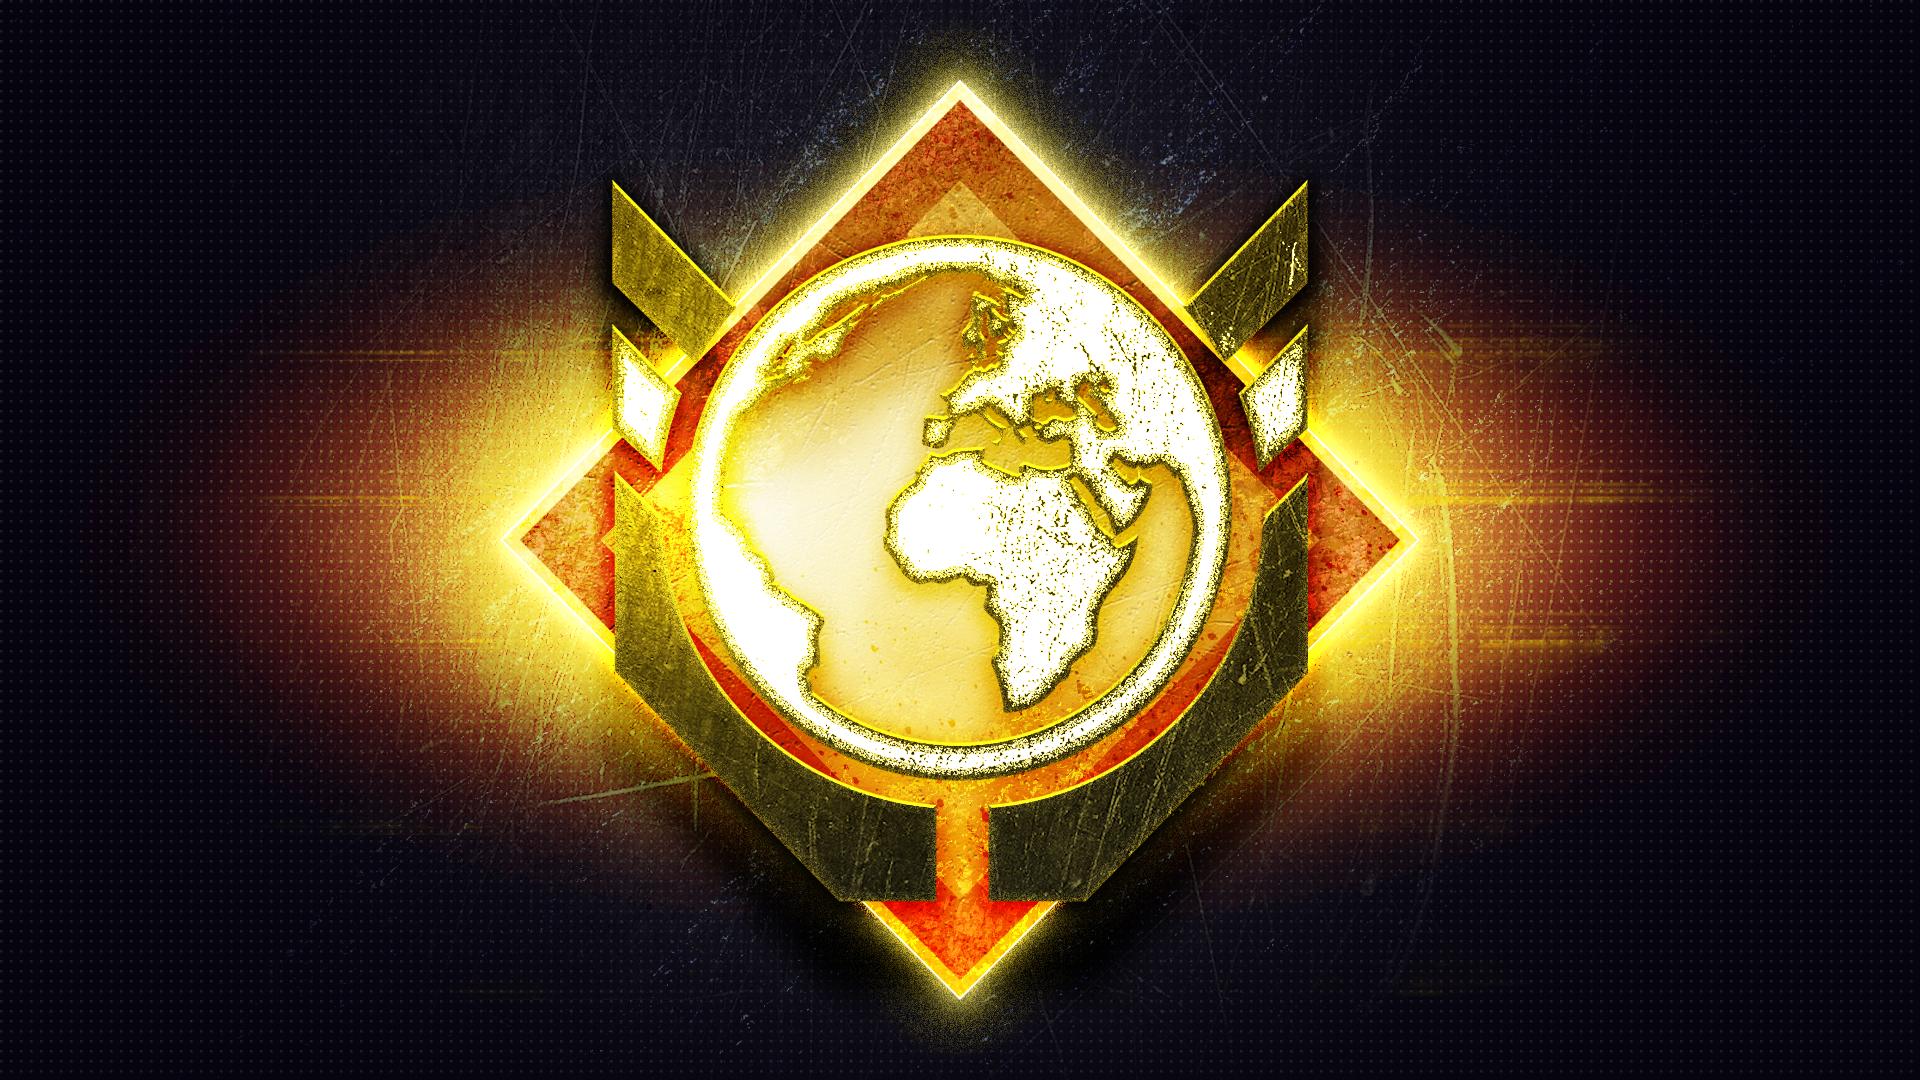 Icon for Savior